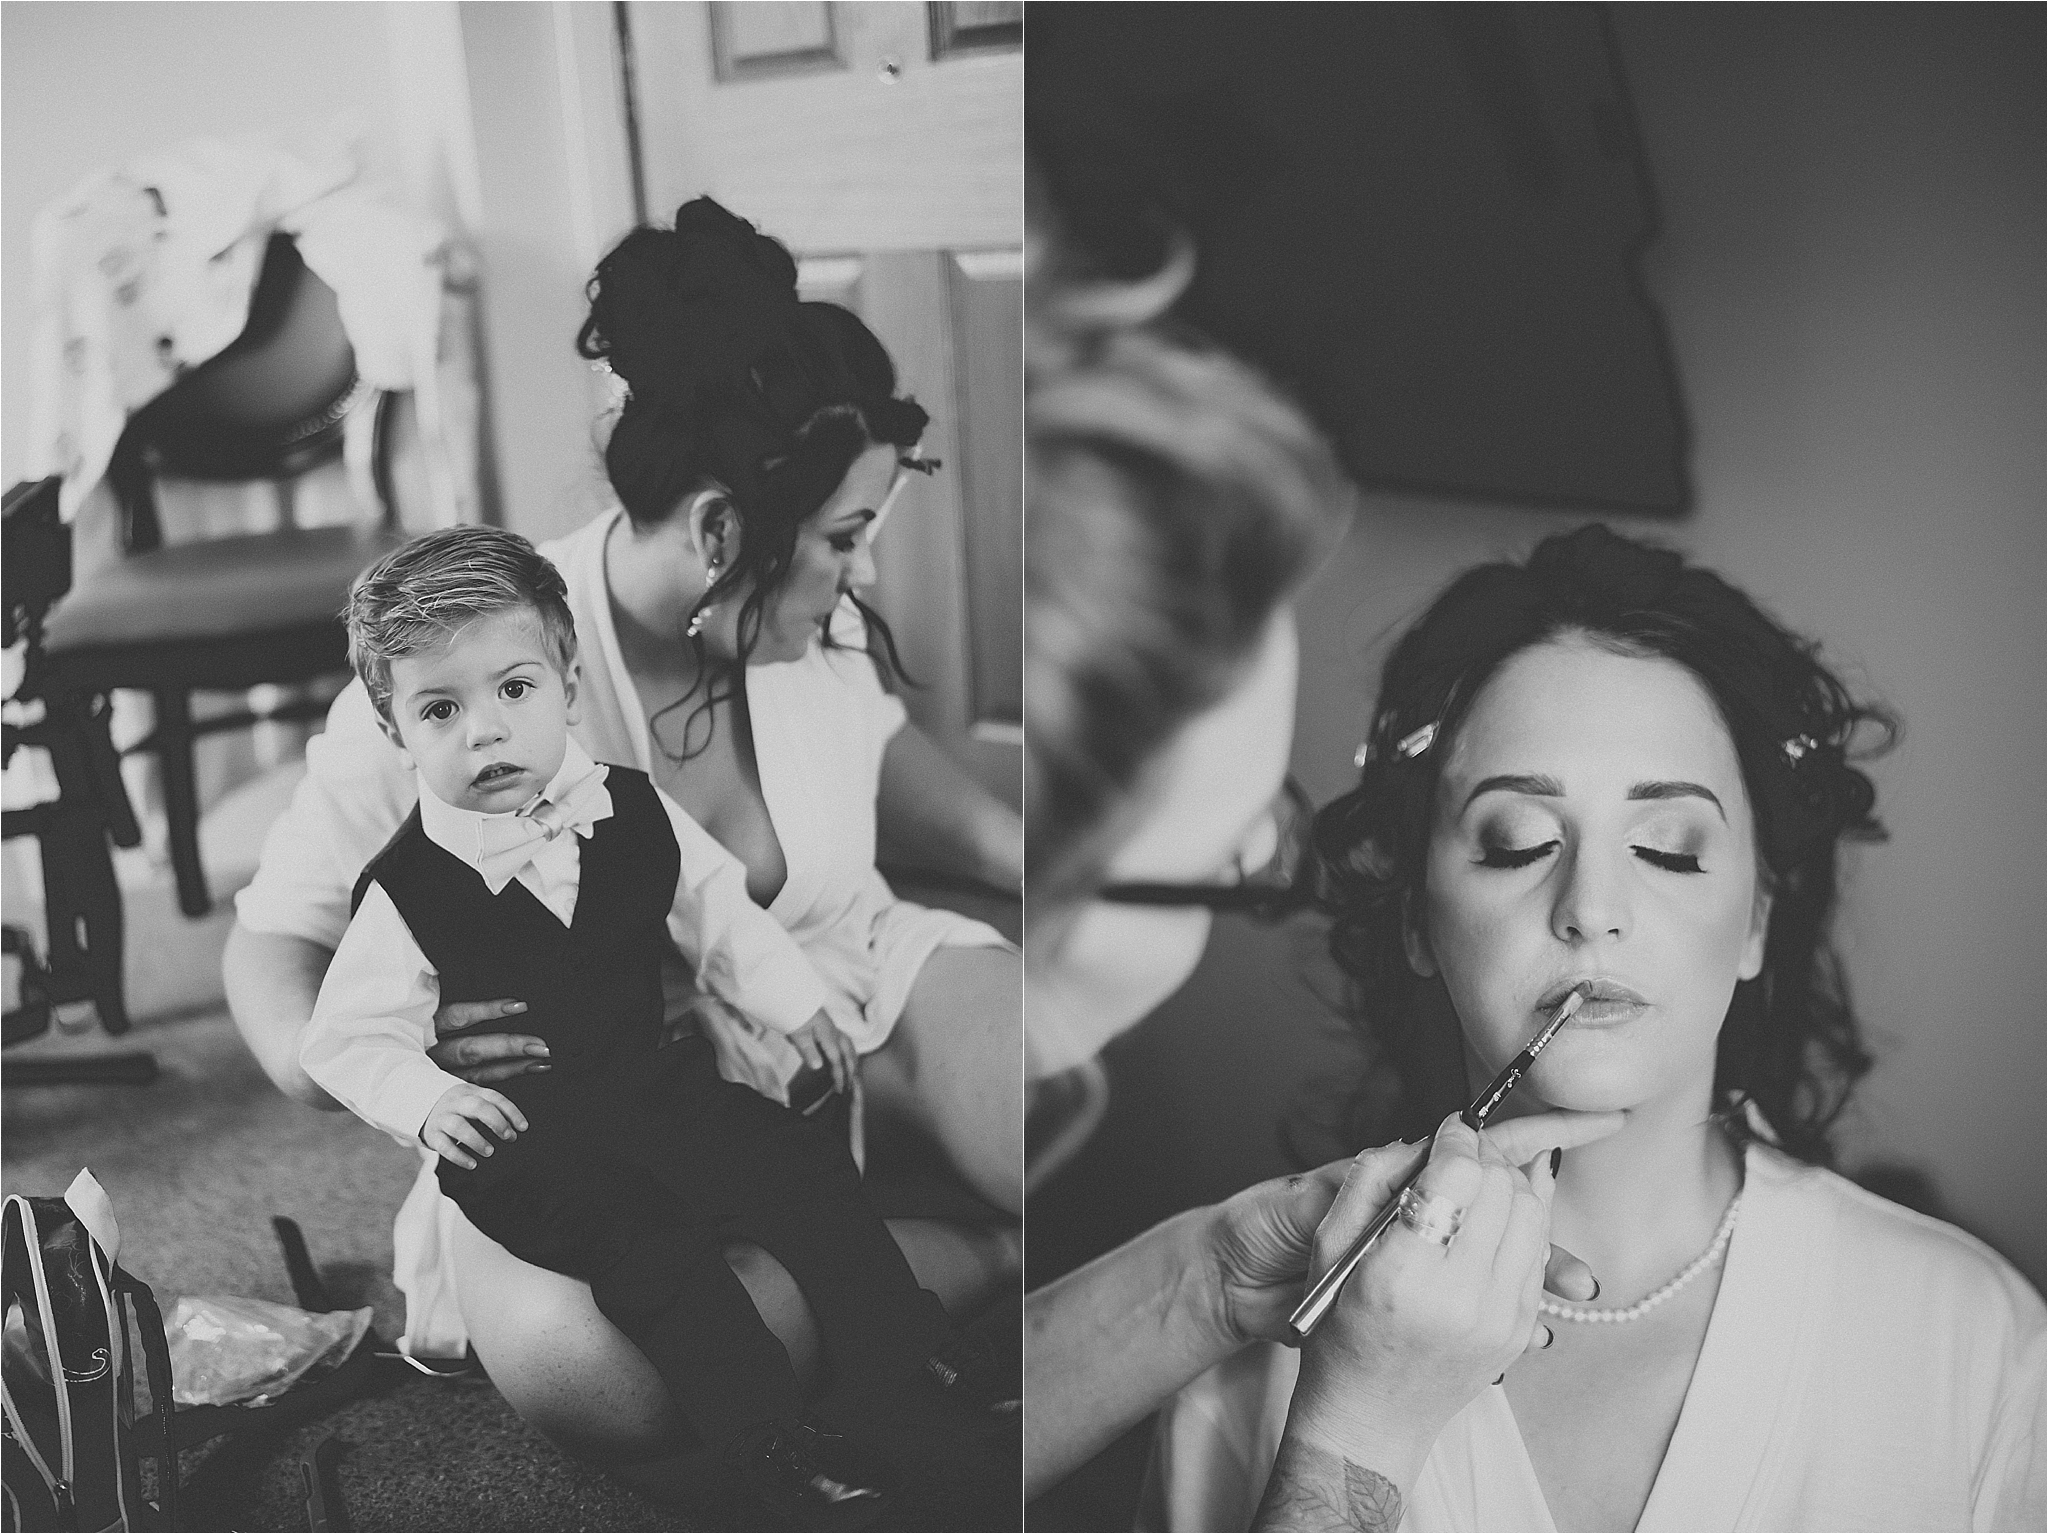 thevilla+lancashire+wreagreen+wedding+photographer12.jpg